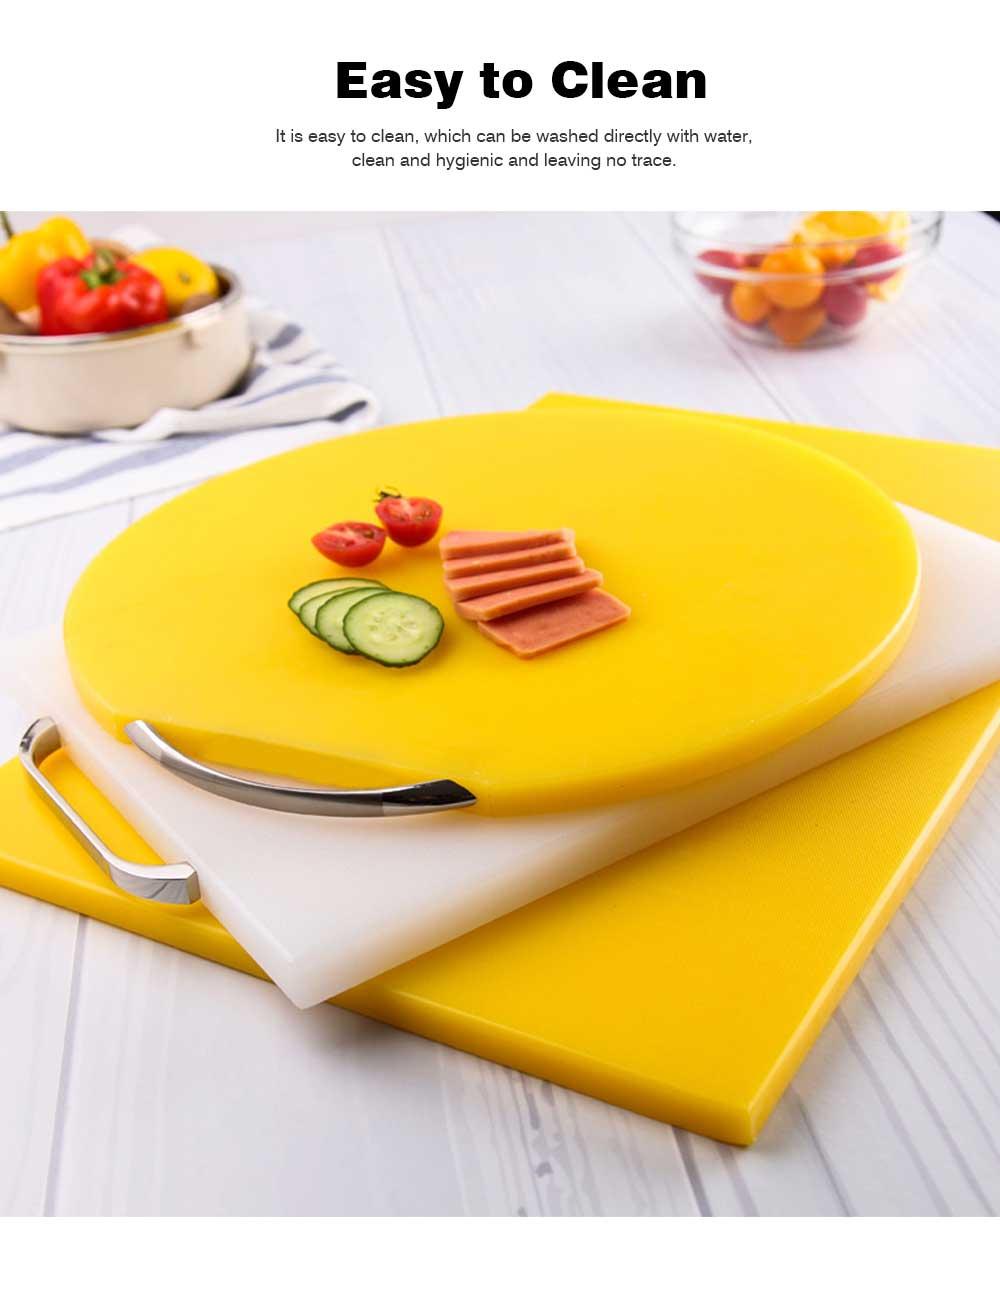 Anti-slip Multi-function Cutting Board, High-quality PE Cutting Board for Cutting Cooked Food, Vegetables, Fruits 6